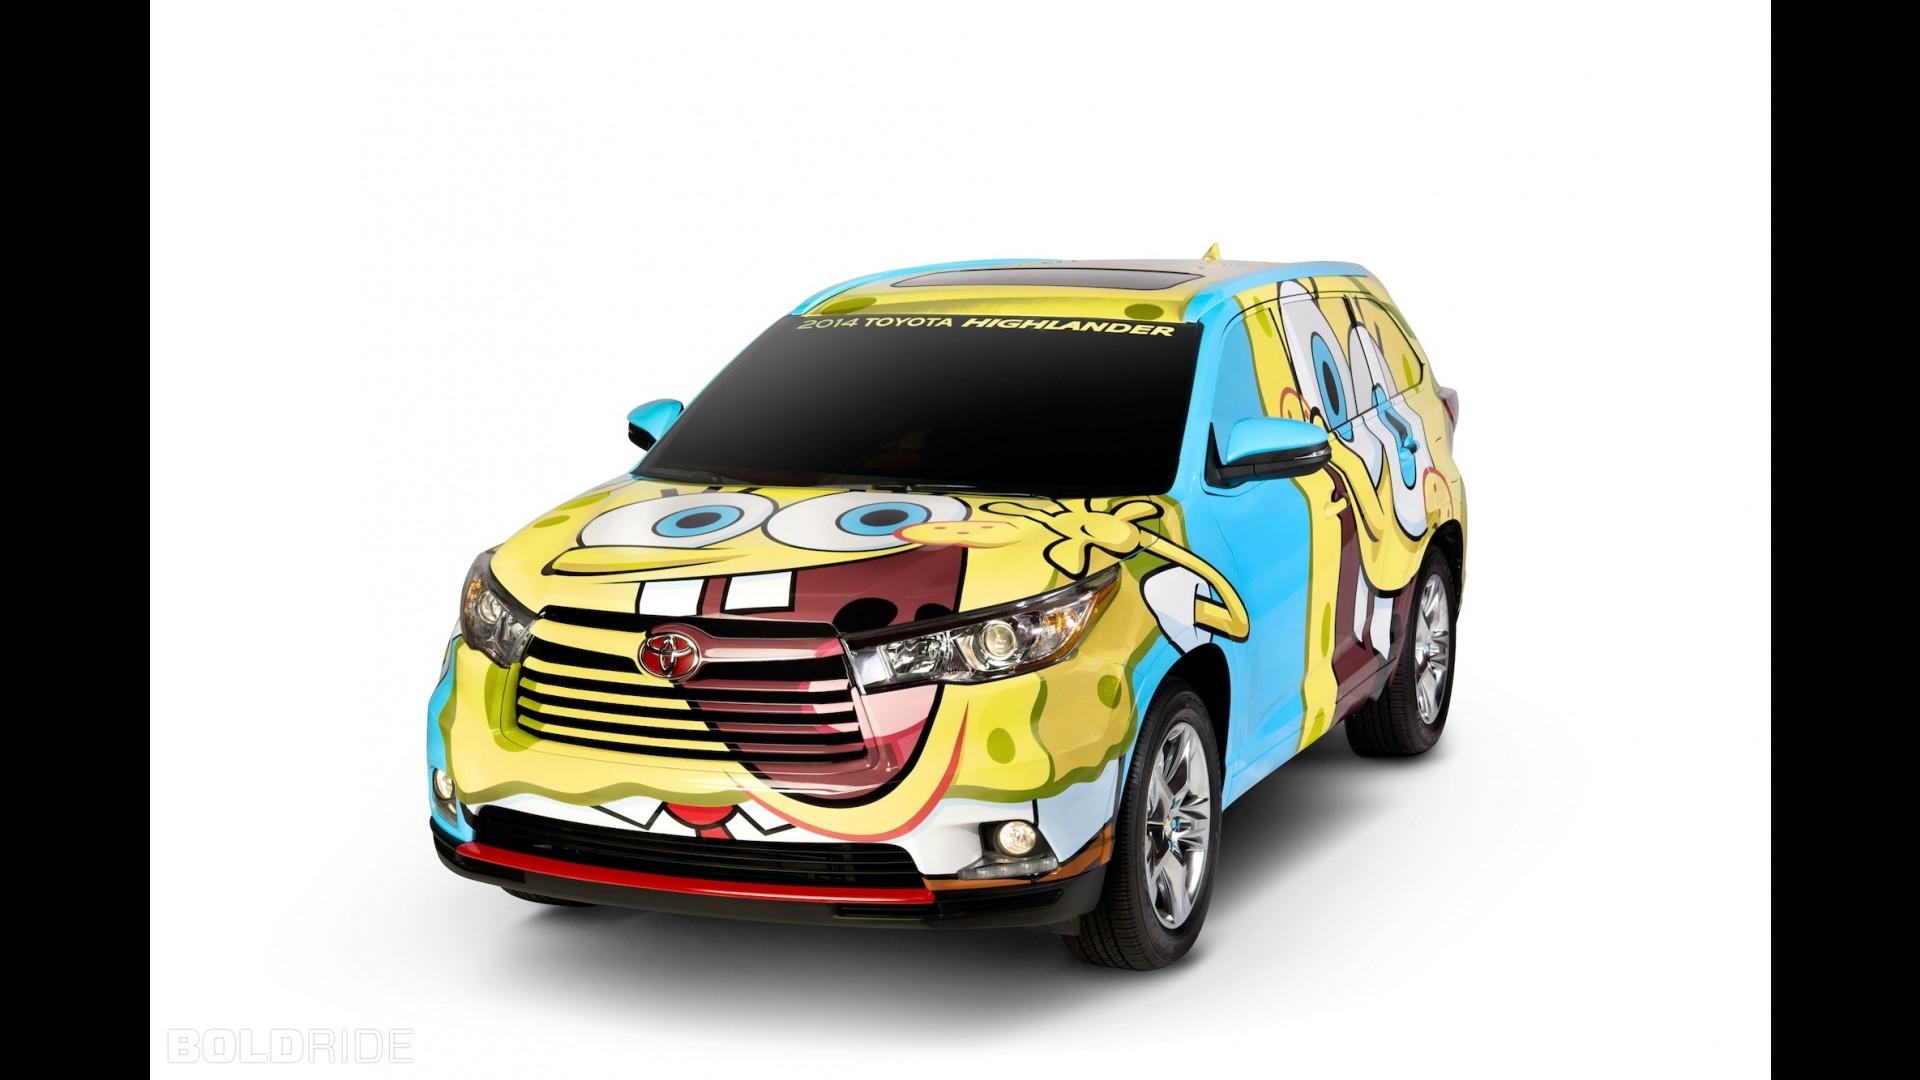 Toyota Highlander Spongebob Concept